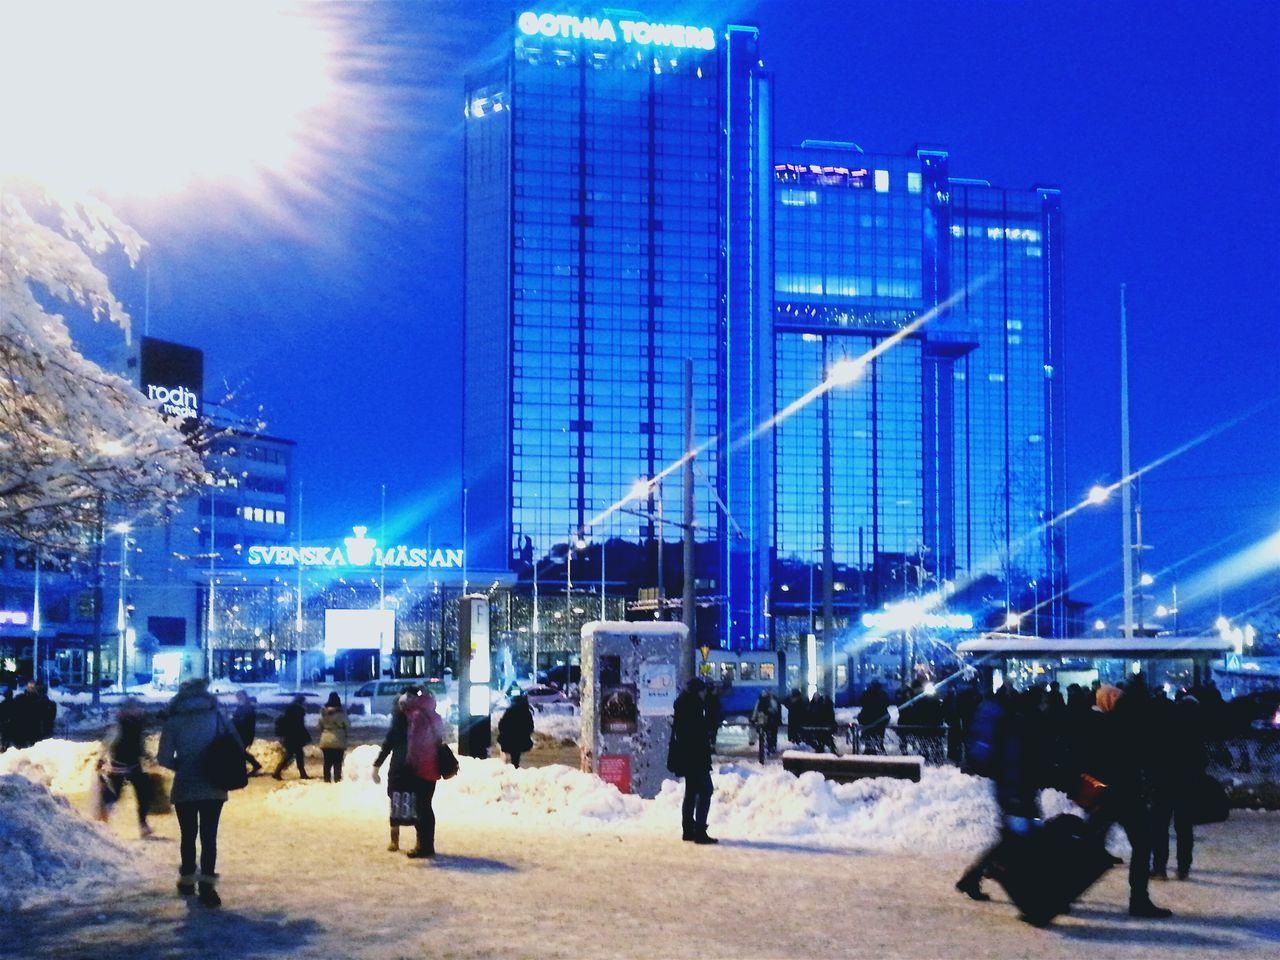 Gothia Towers By Winternight Gothenburg Winterview Snowy Citystreets